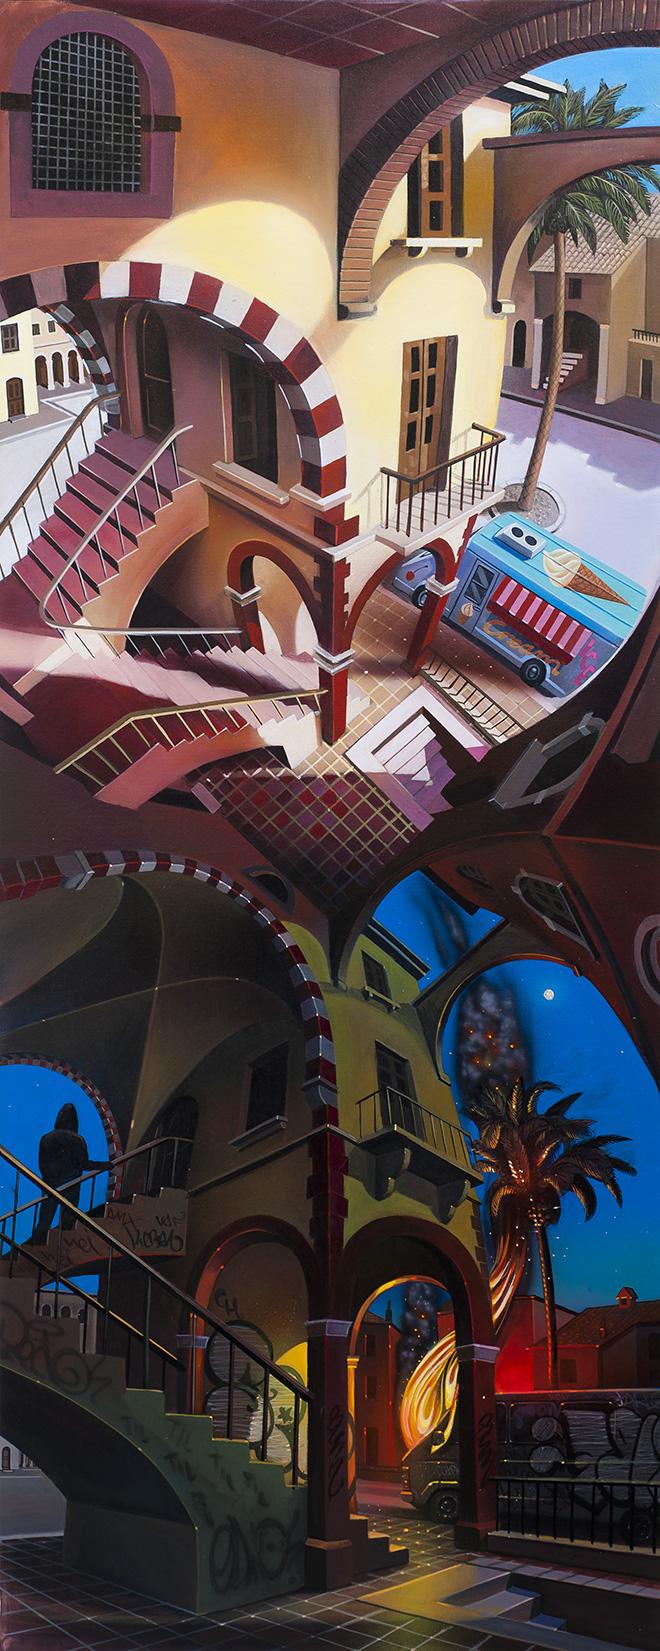 Spok Brillor - Duelo, 2017, acrylic on canvas, 162x65 cm.